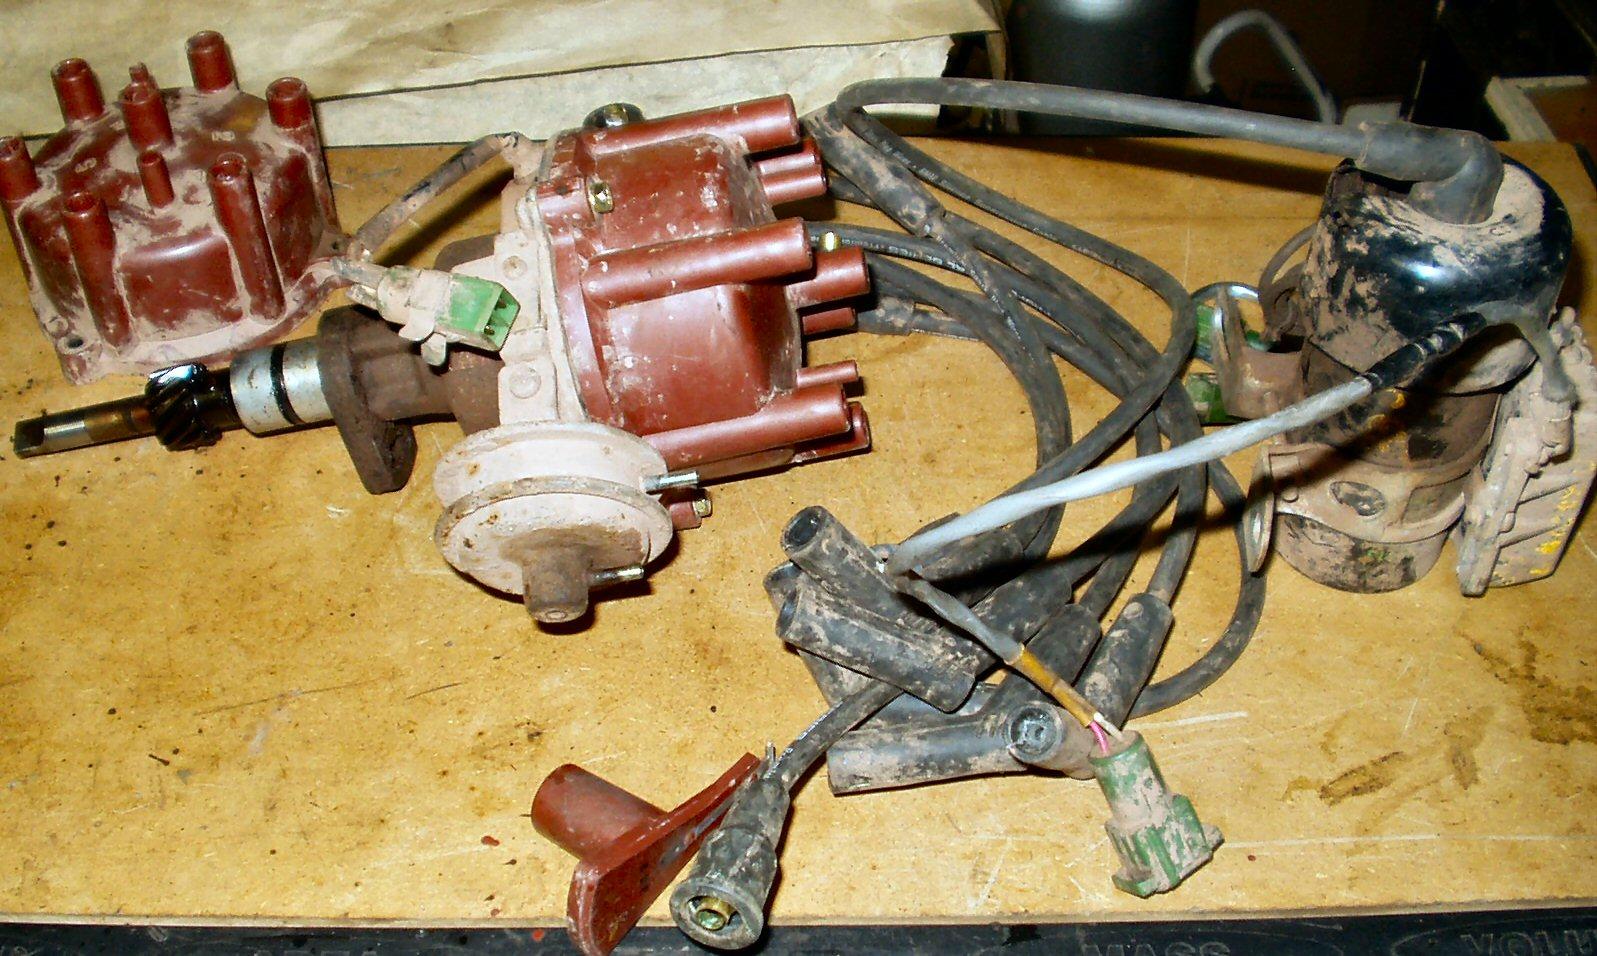 Installing A Fj60 Dizzy Wiring Diagram 1987 What I Got